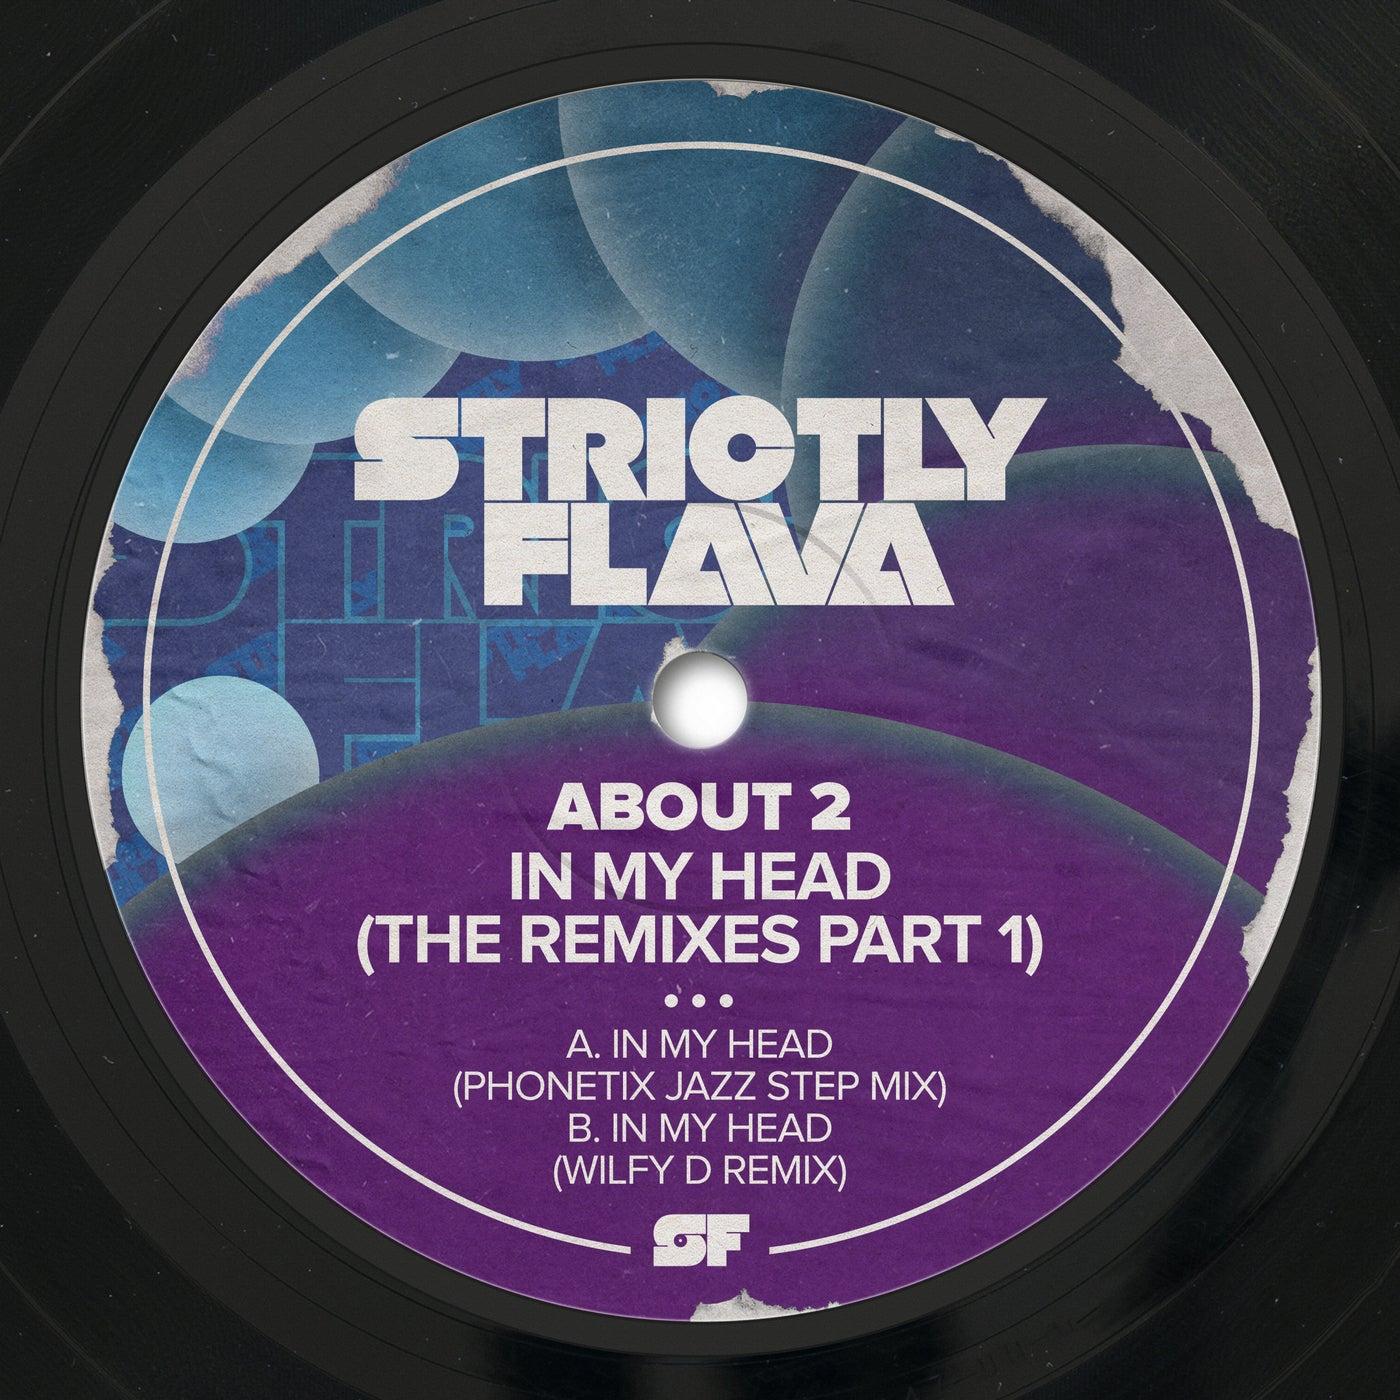 In My Head (Wilfy D Remix)